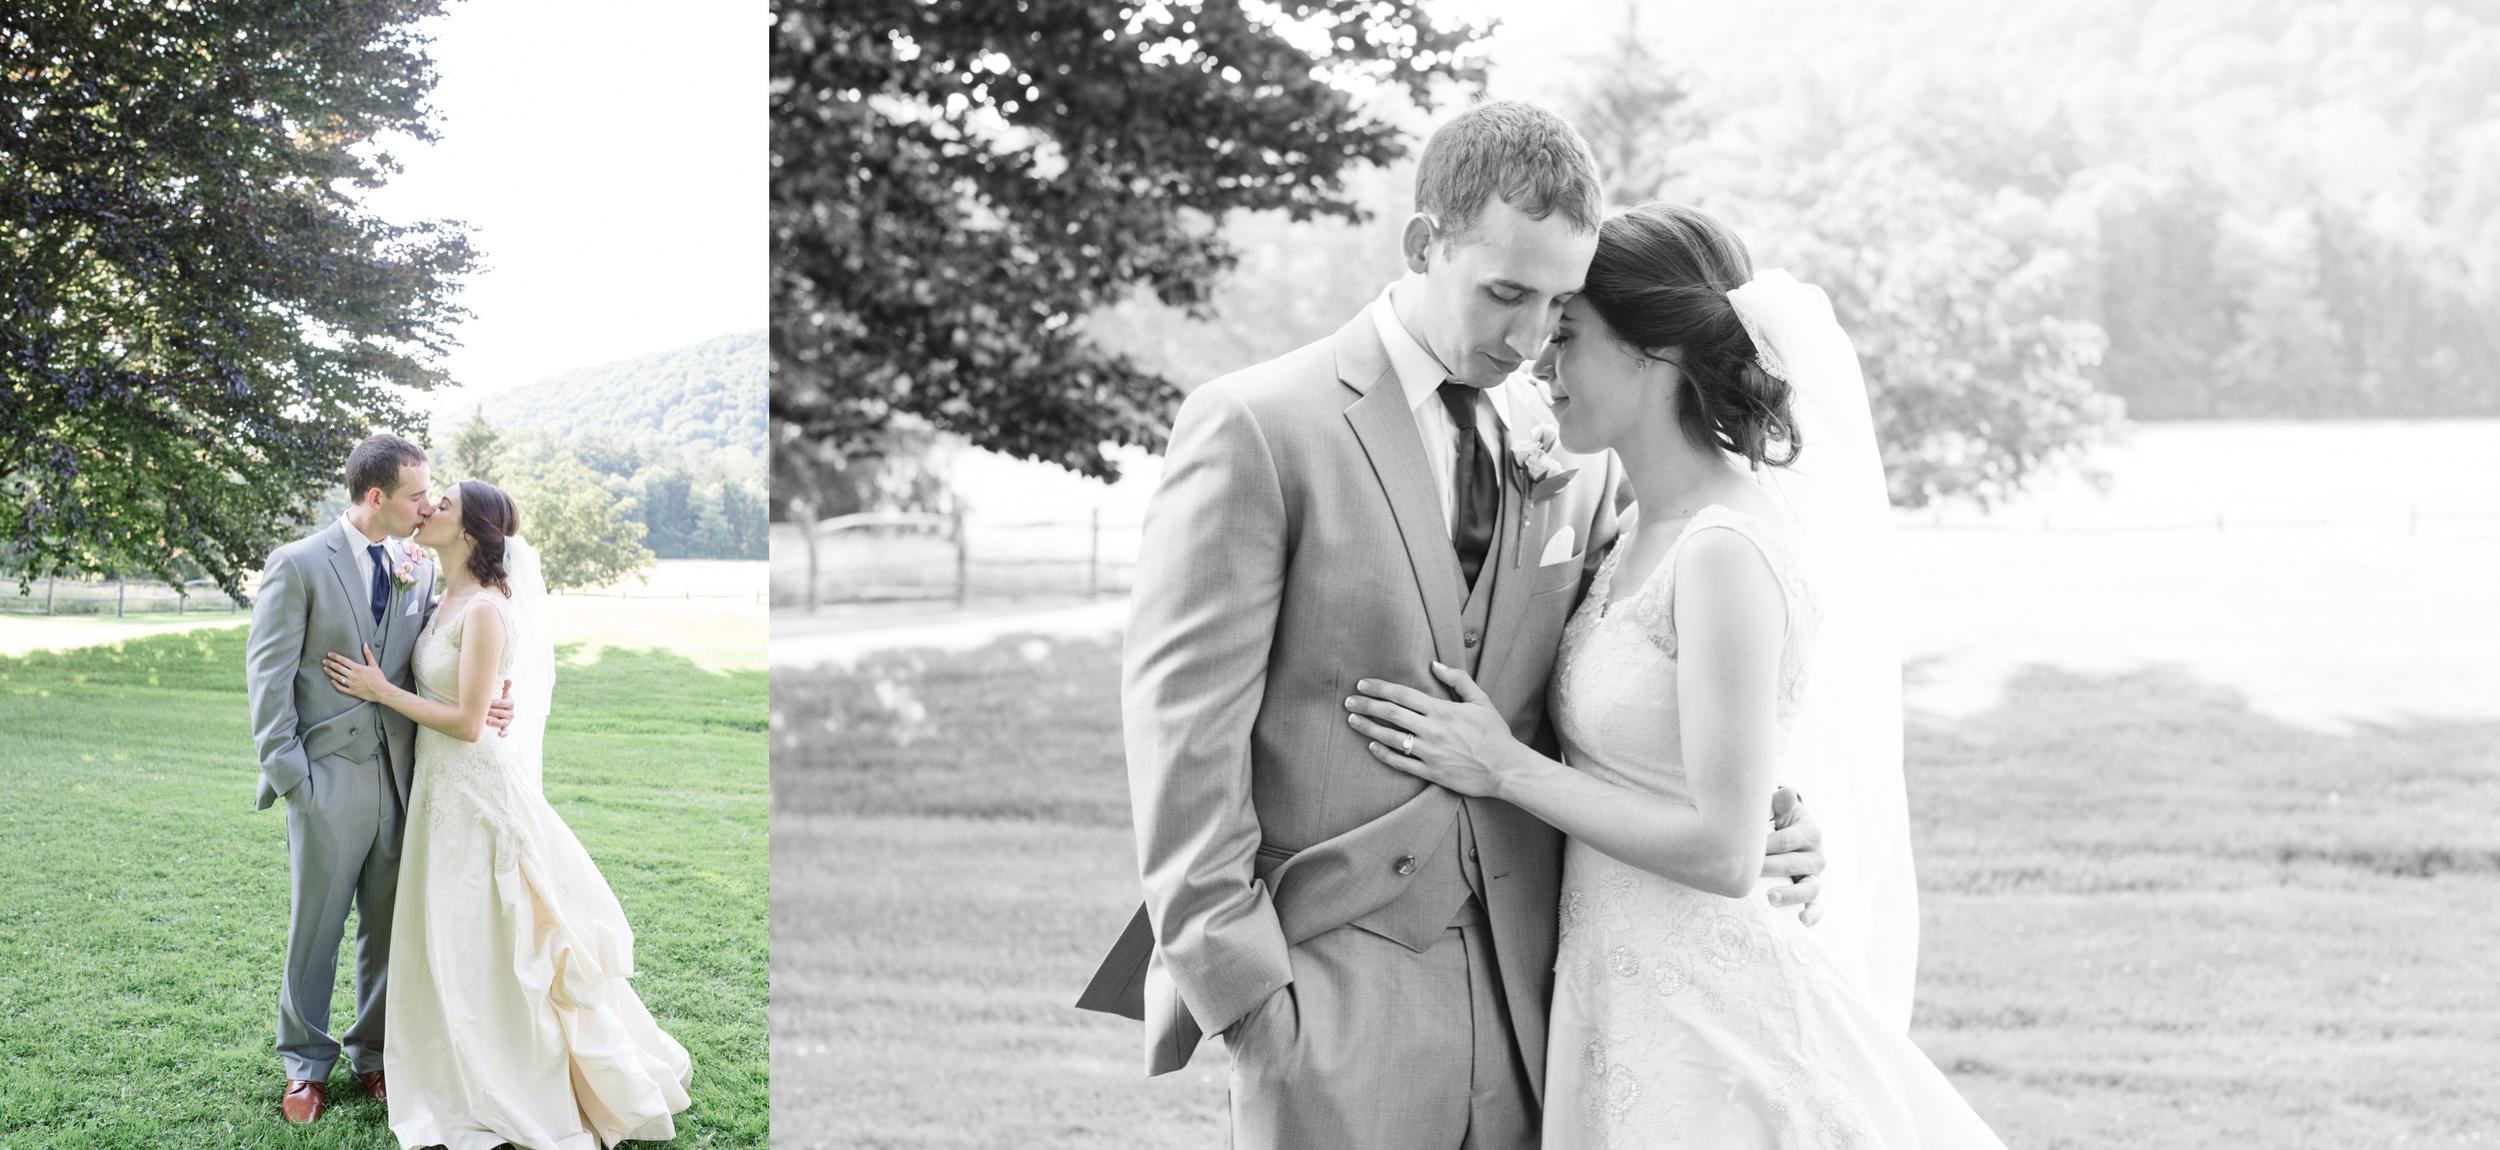 mariah fisher photography bridal portraits.jpg